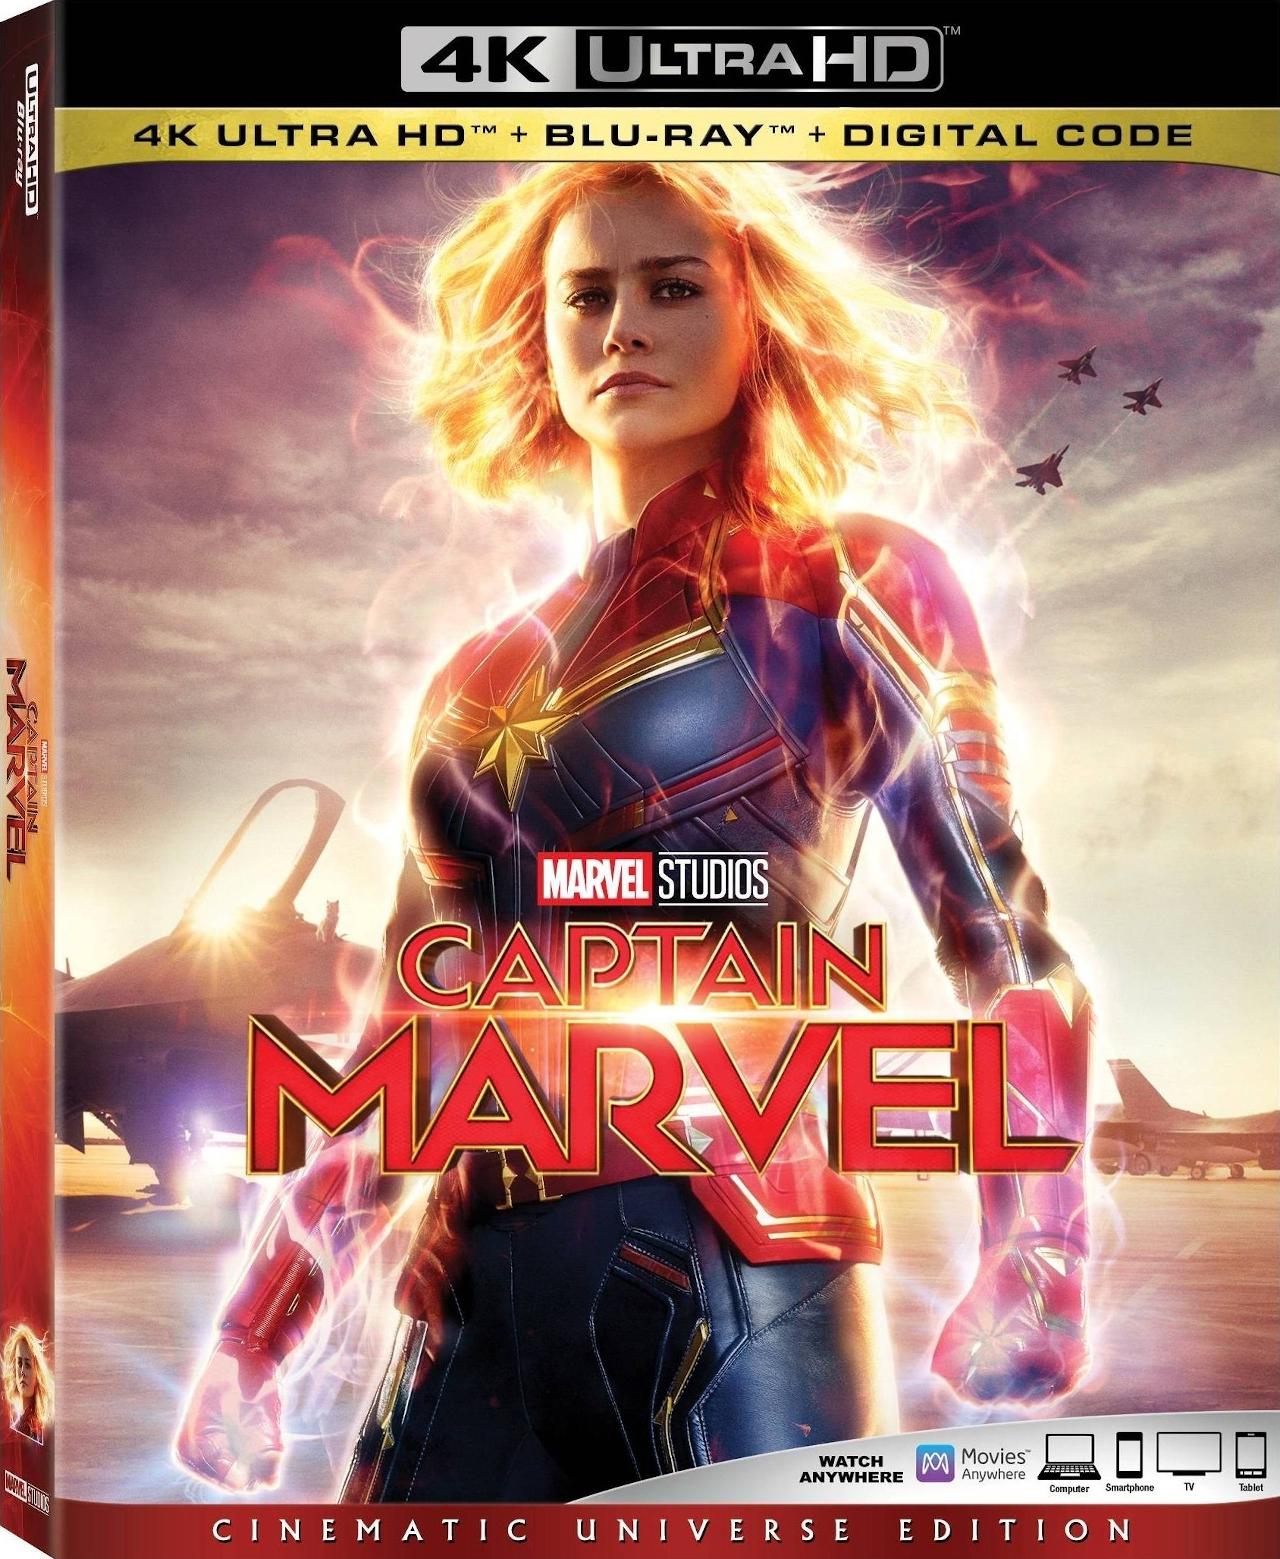 Captain Marvel 4K UHD - Best 4K Blu-ray Marvel Superhero Movies